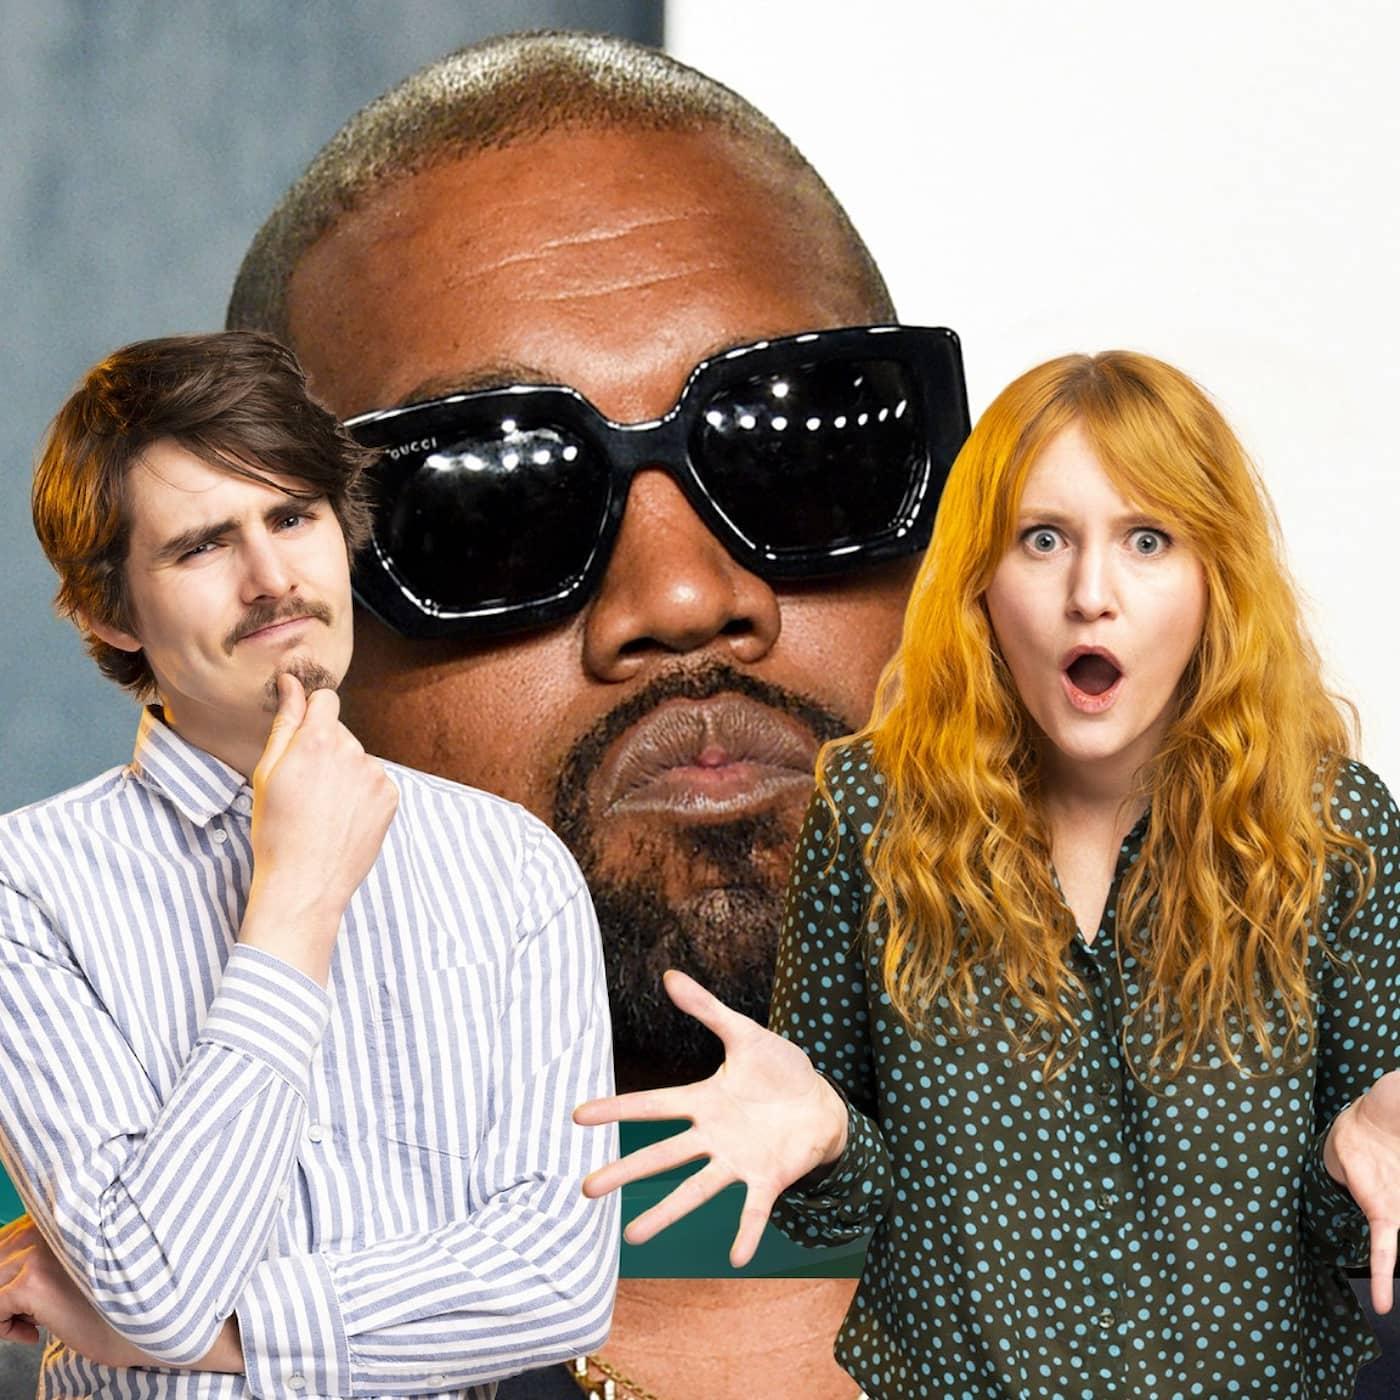 Kanye käkade dippsås i Trollhättan?